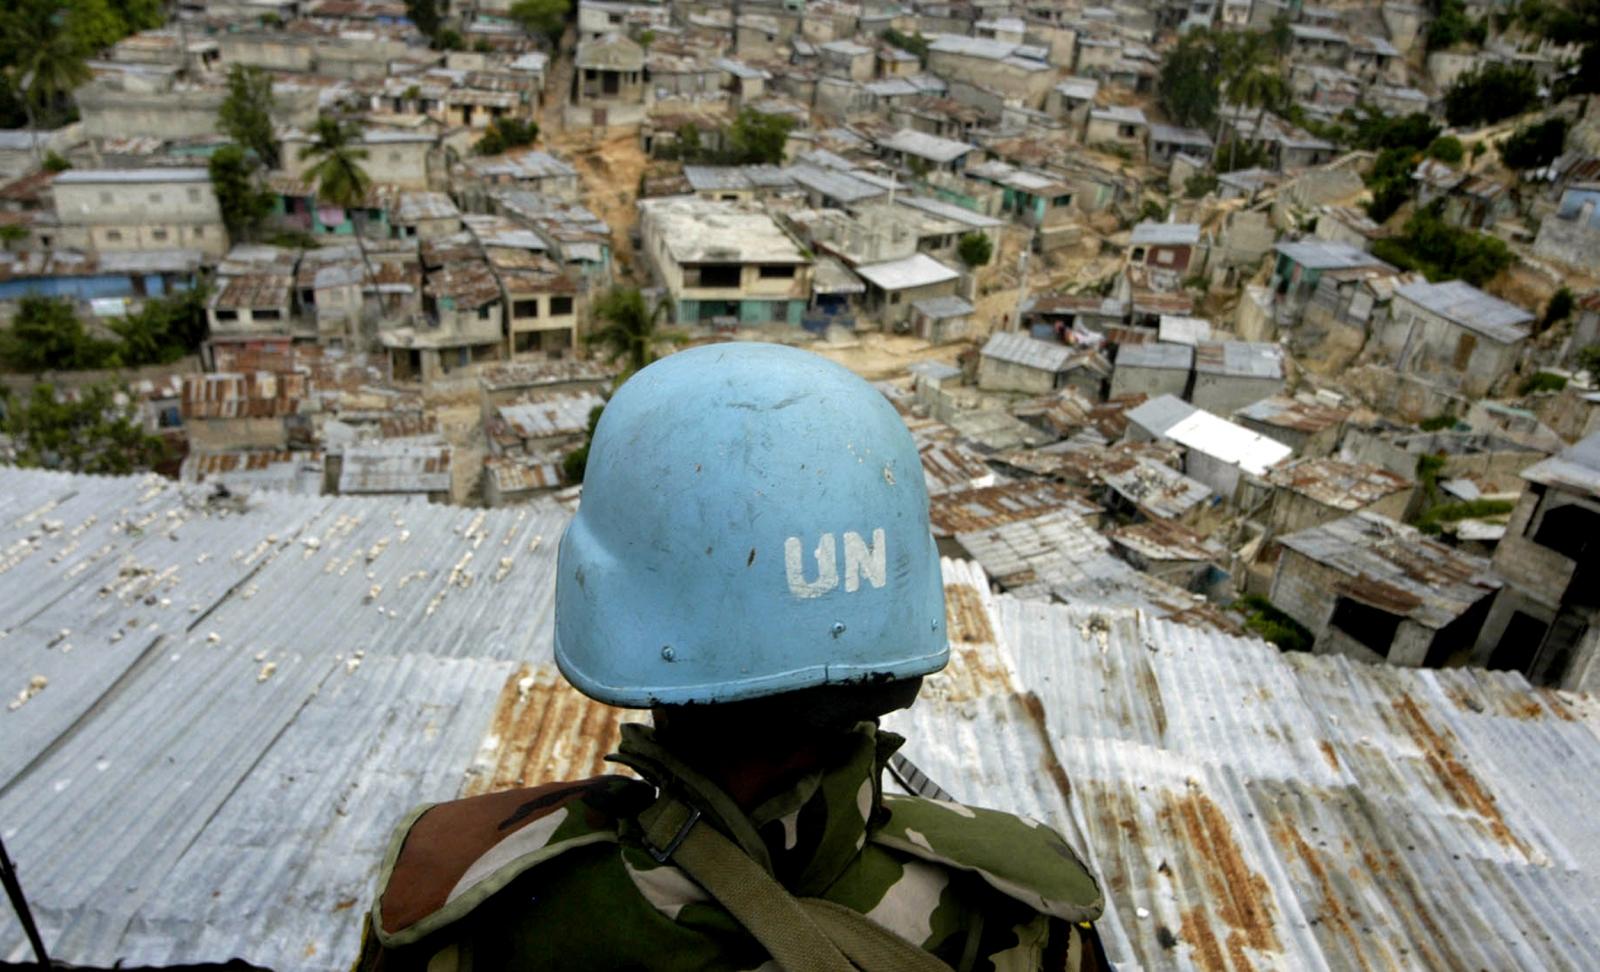 Sri Lankan Un Peacekeepers Accused Of Involvement In Haiti Child Sex Ring